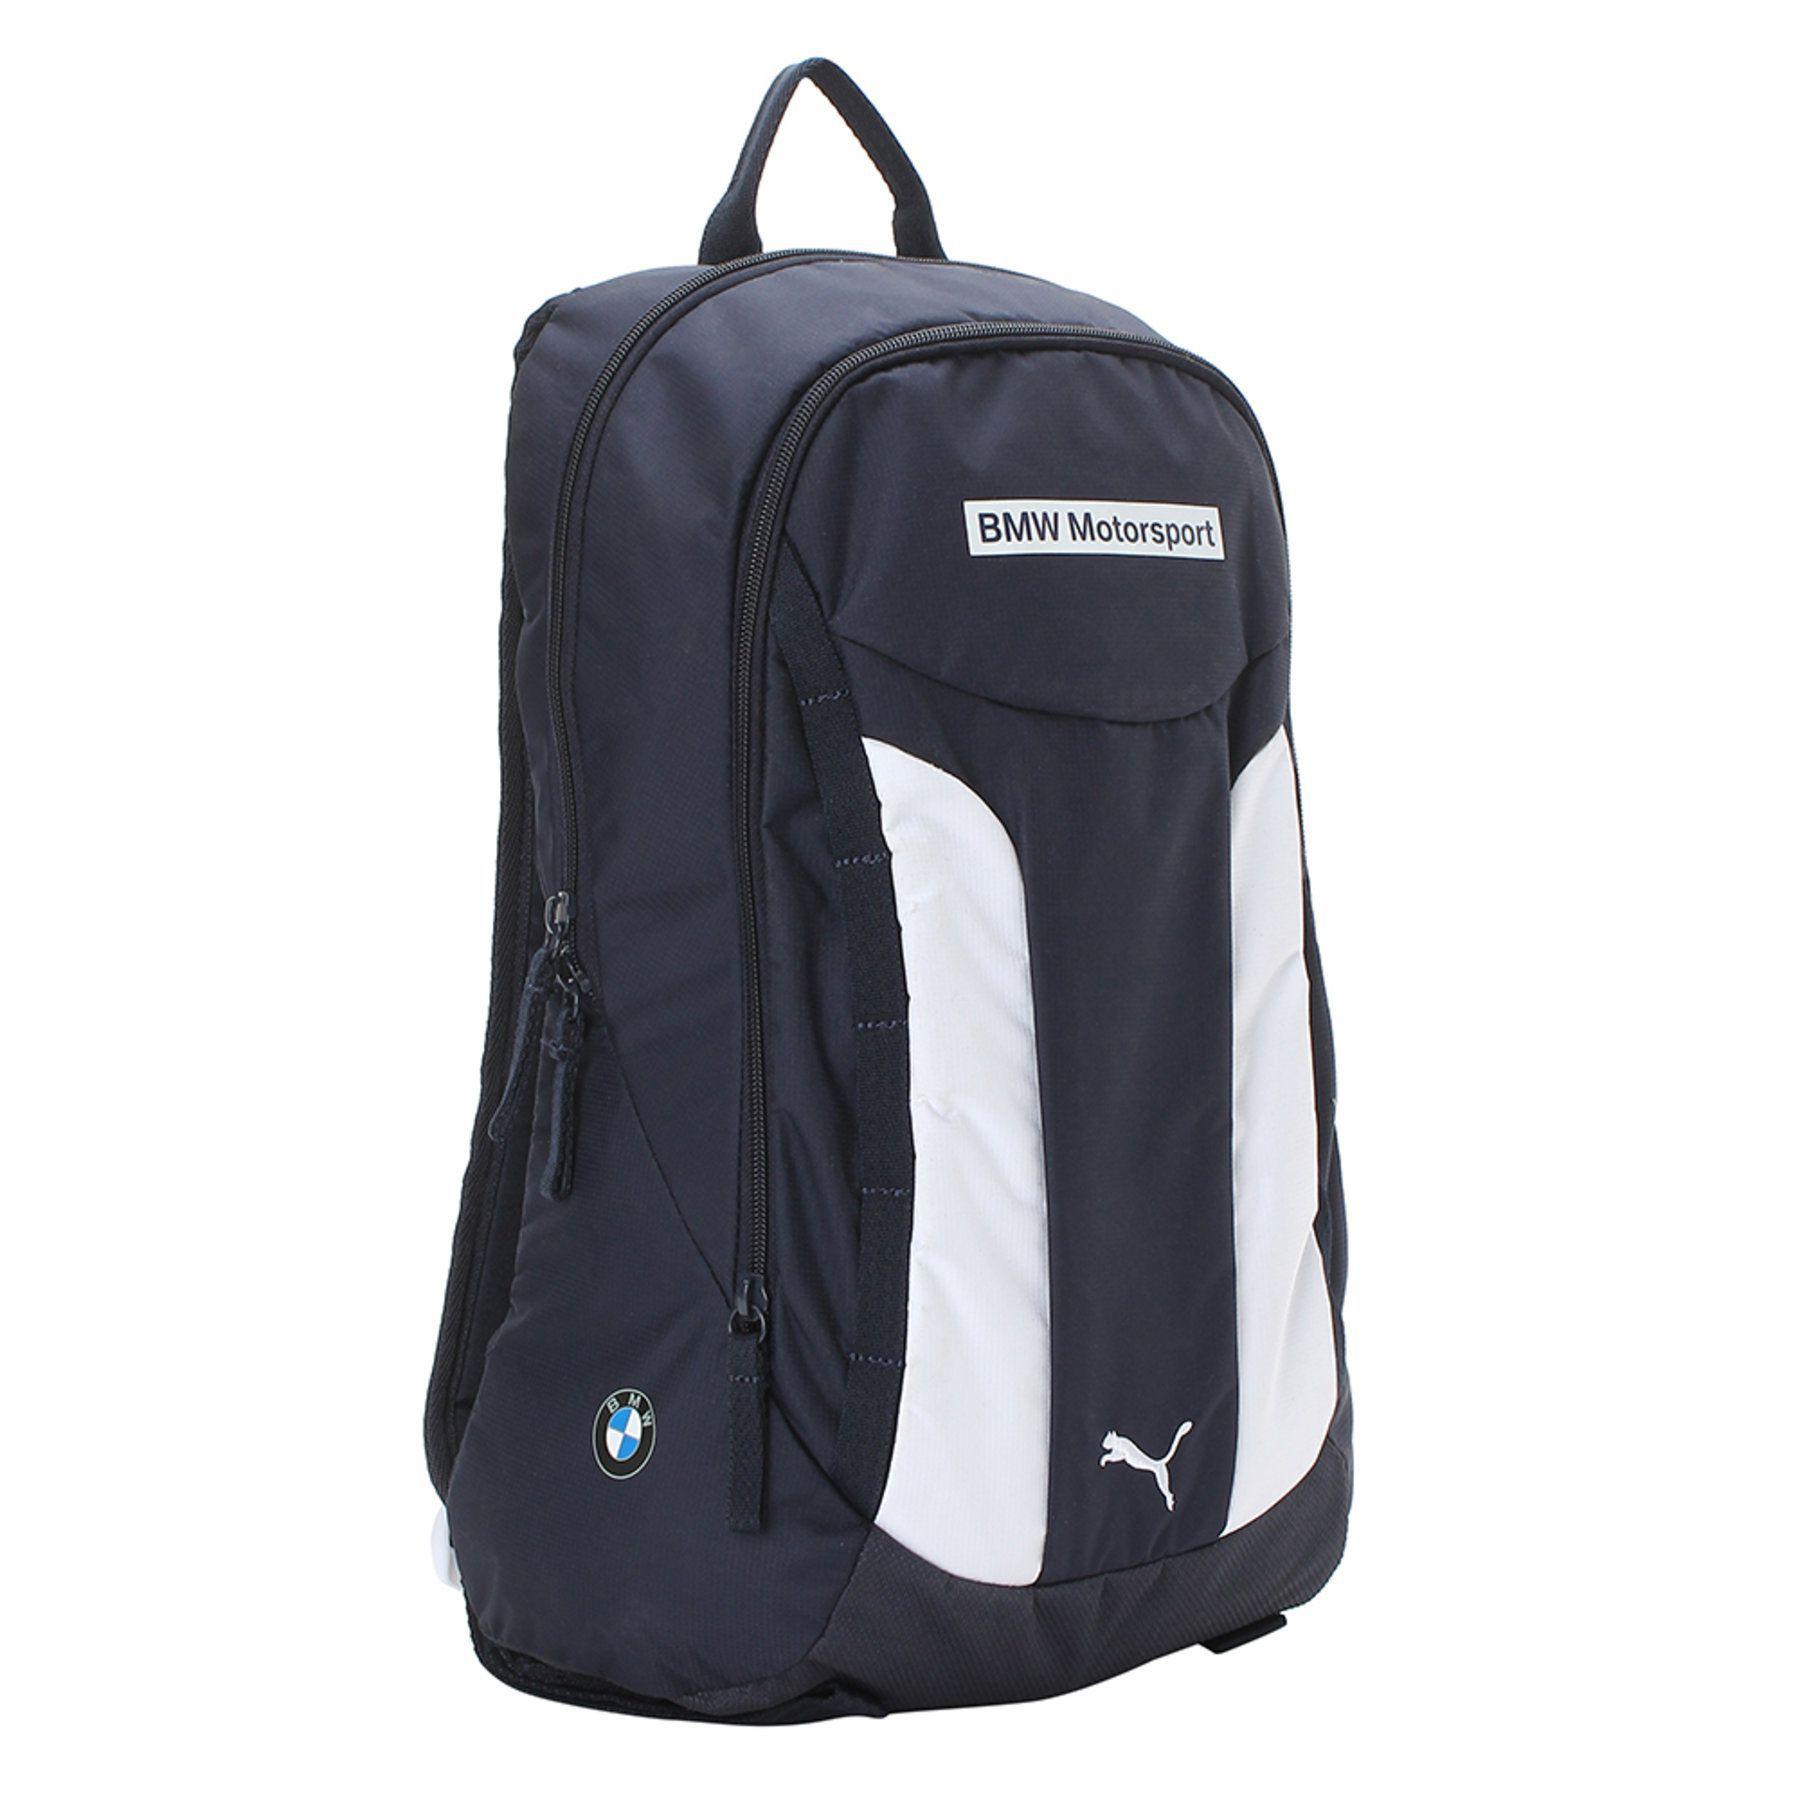 67543b60650f Puma Navy Motorsport Backpack - Buy Puma Navy Motorsport Backpack ...